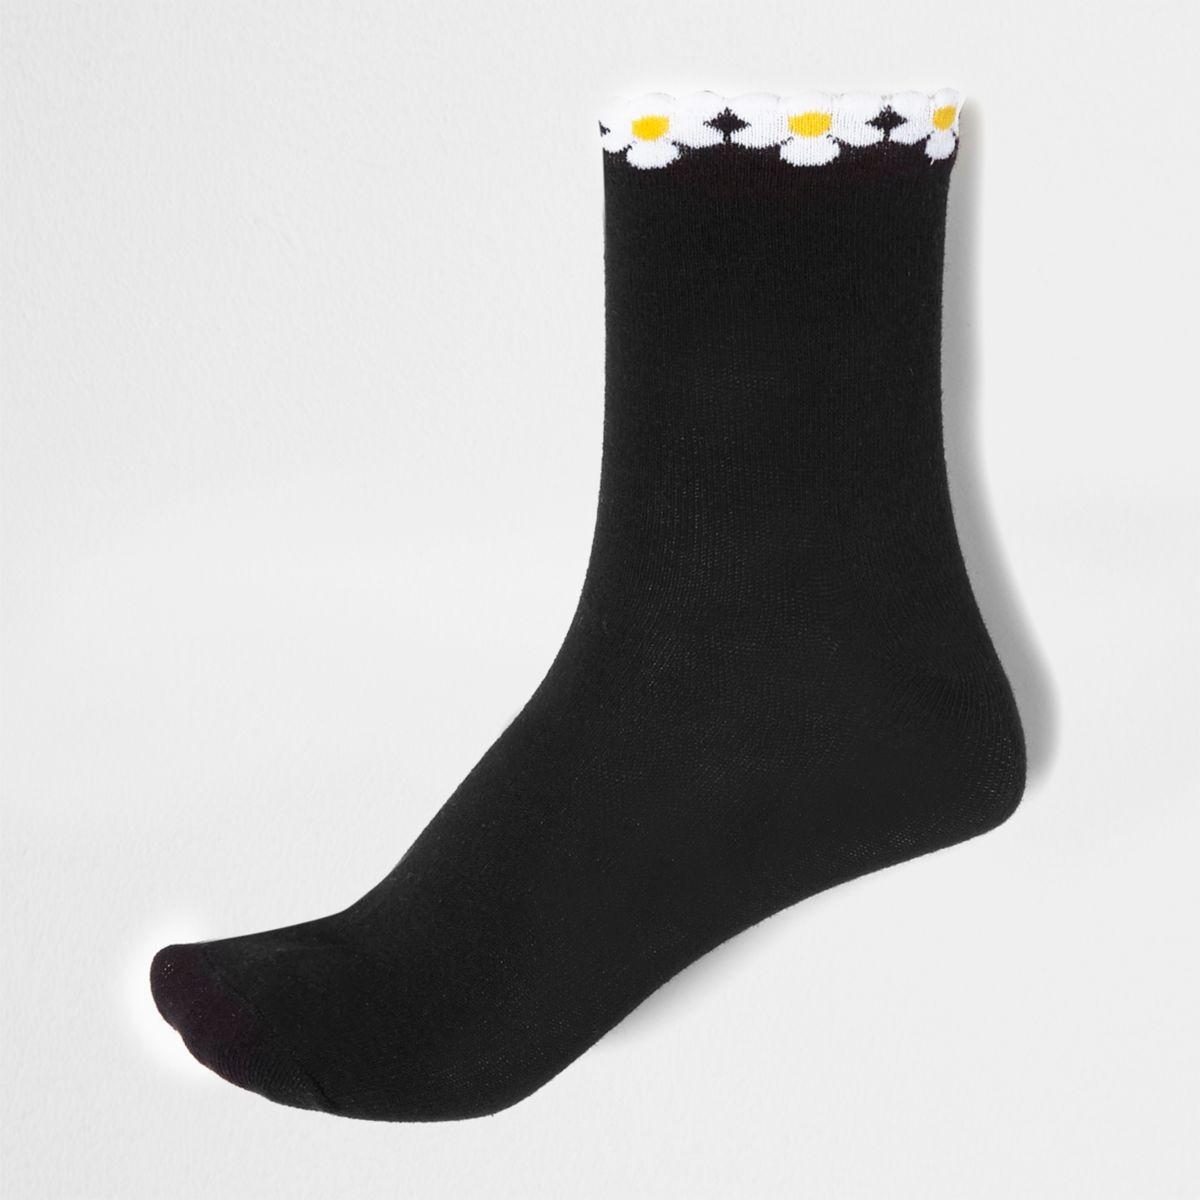 Schwarze Sneakersocken mit Blümchensaum